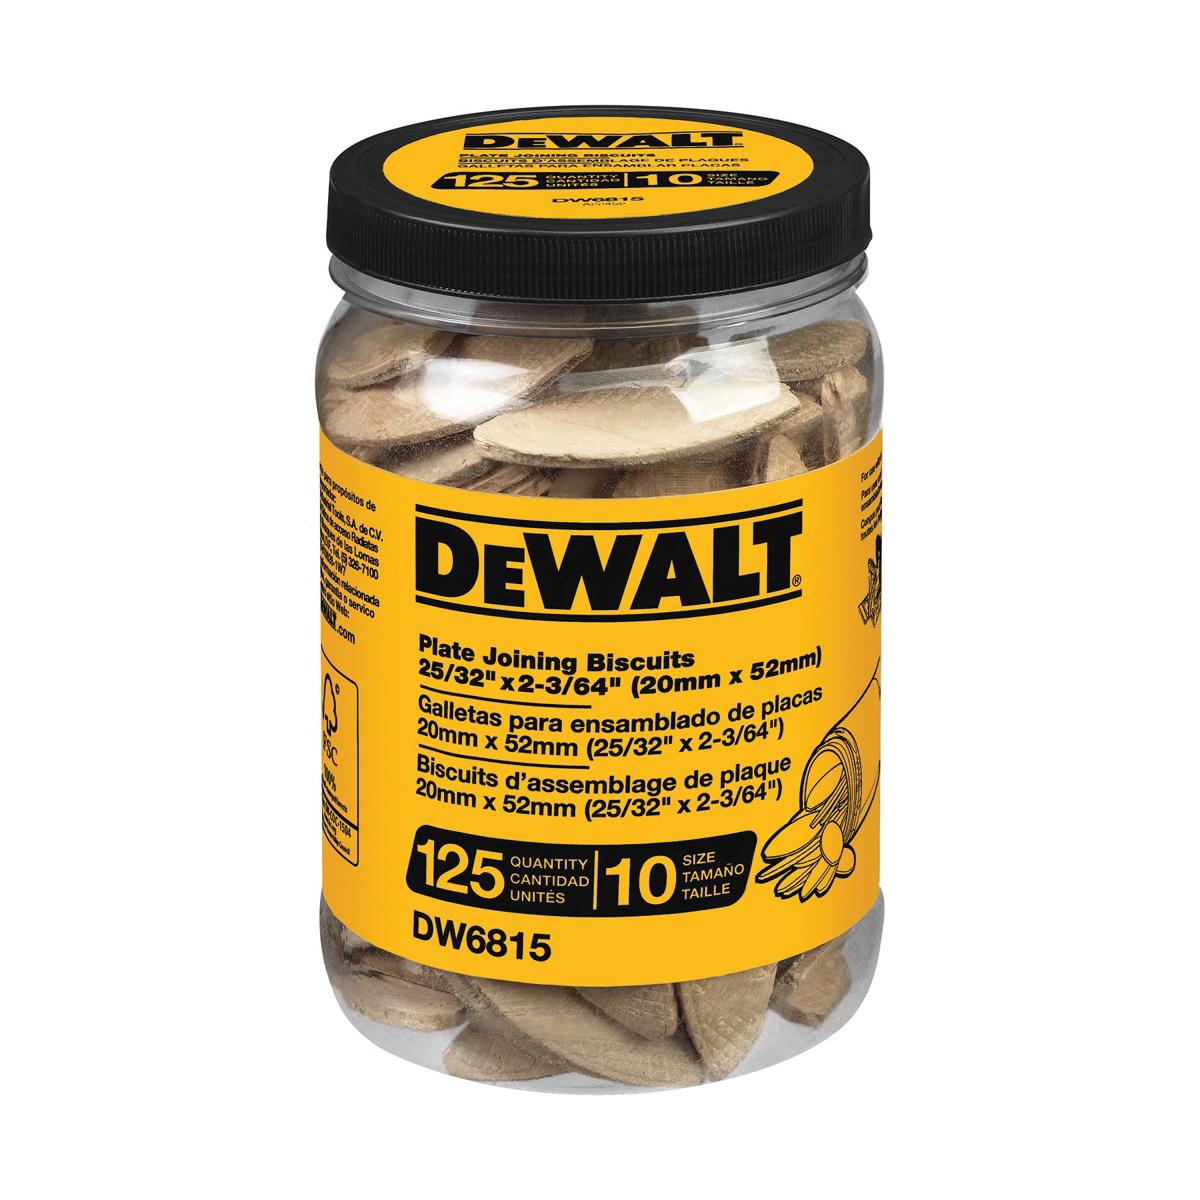 DeWALT® DW6815 Plate Joining Biscuit, Size #10